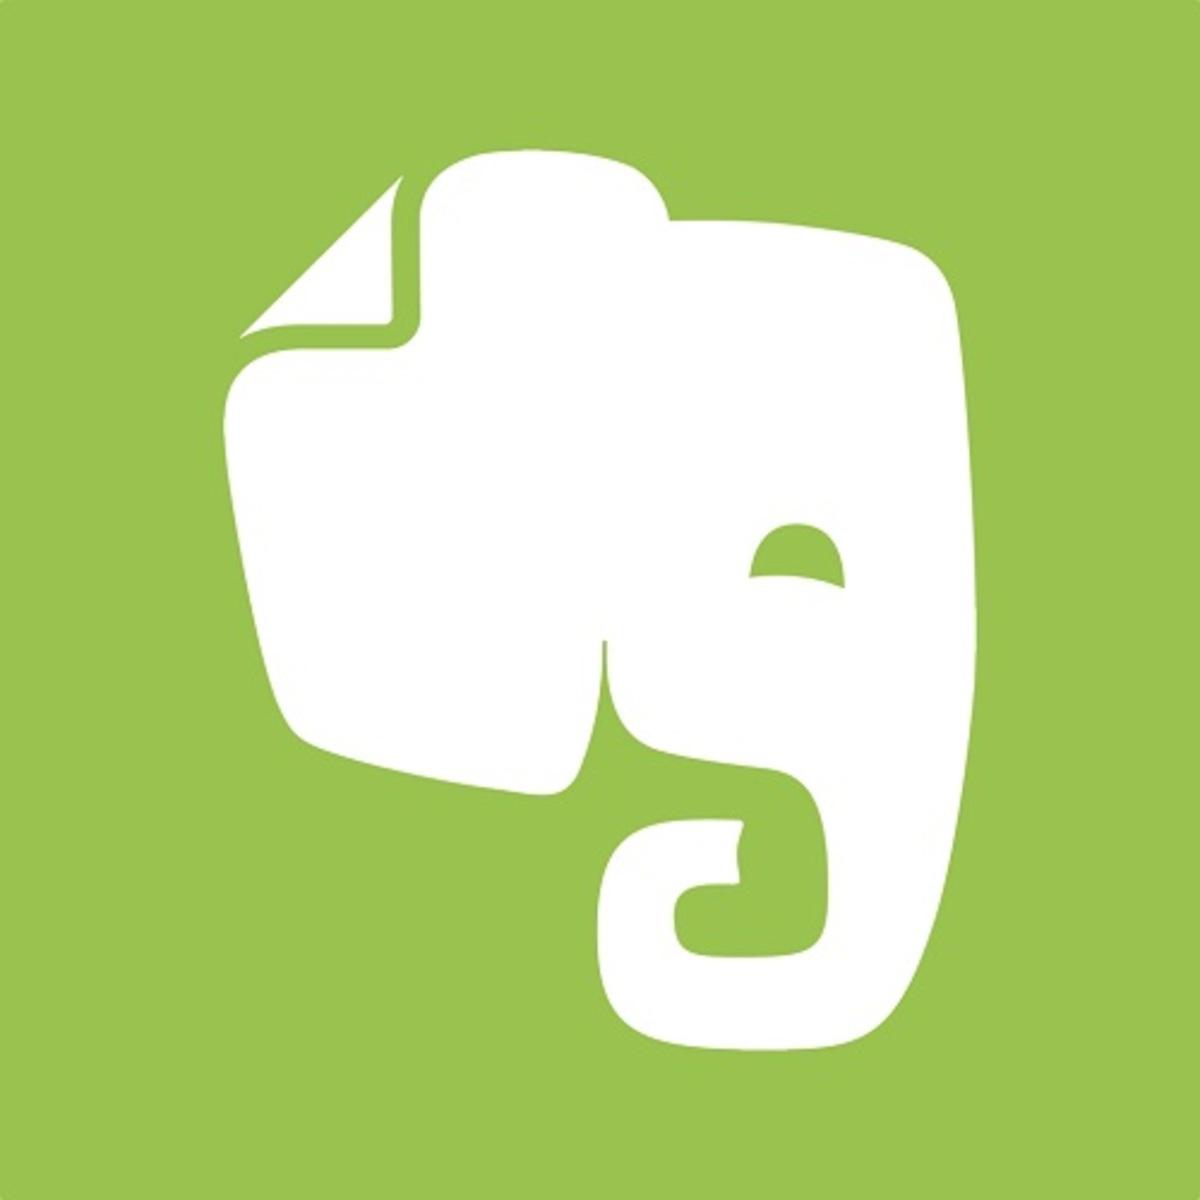 Evernote icon image